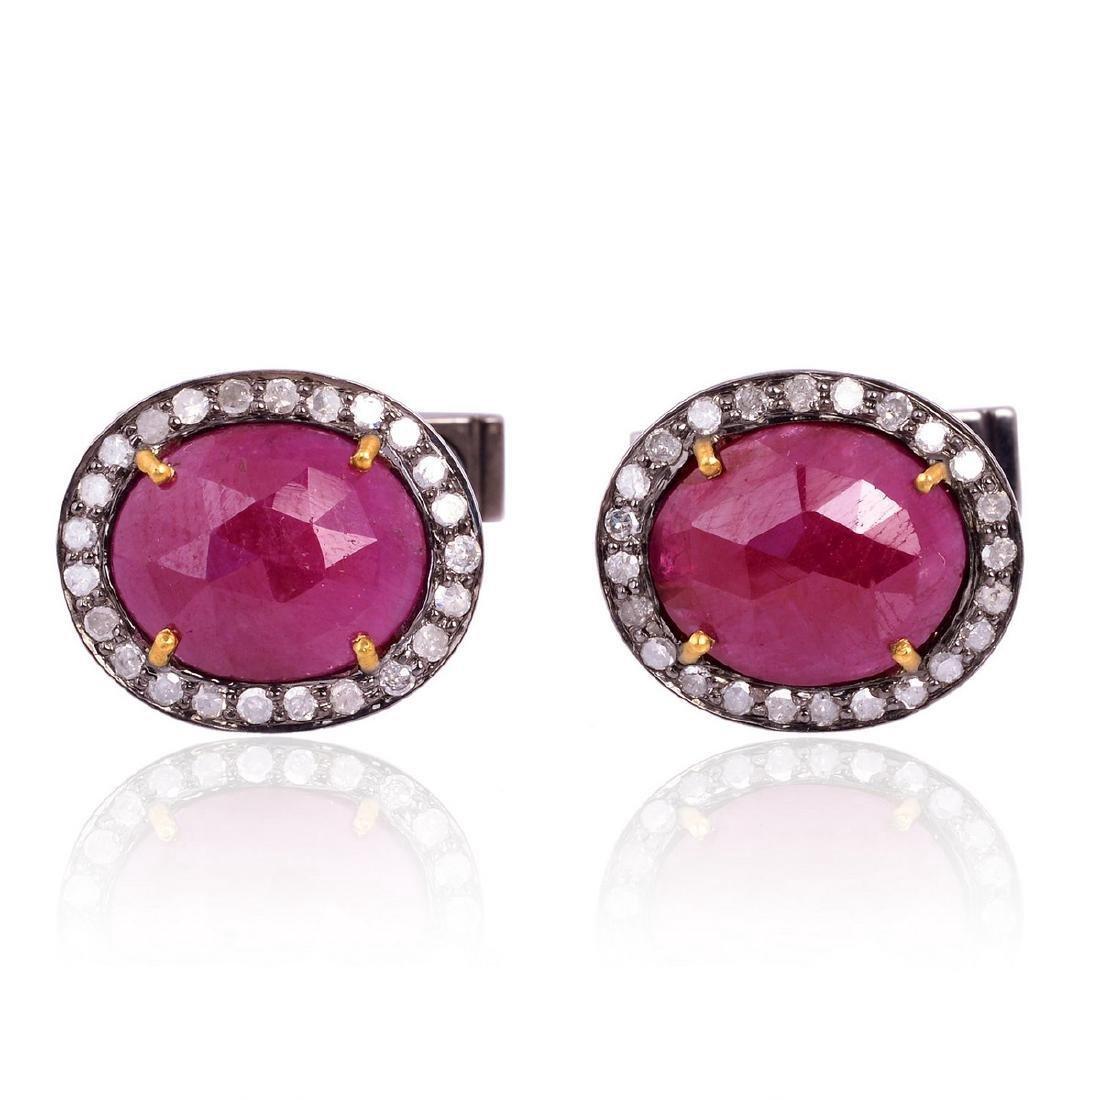 18K Gold Sterling Silver Ruby Diamond Cufflink